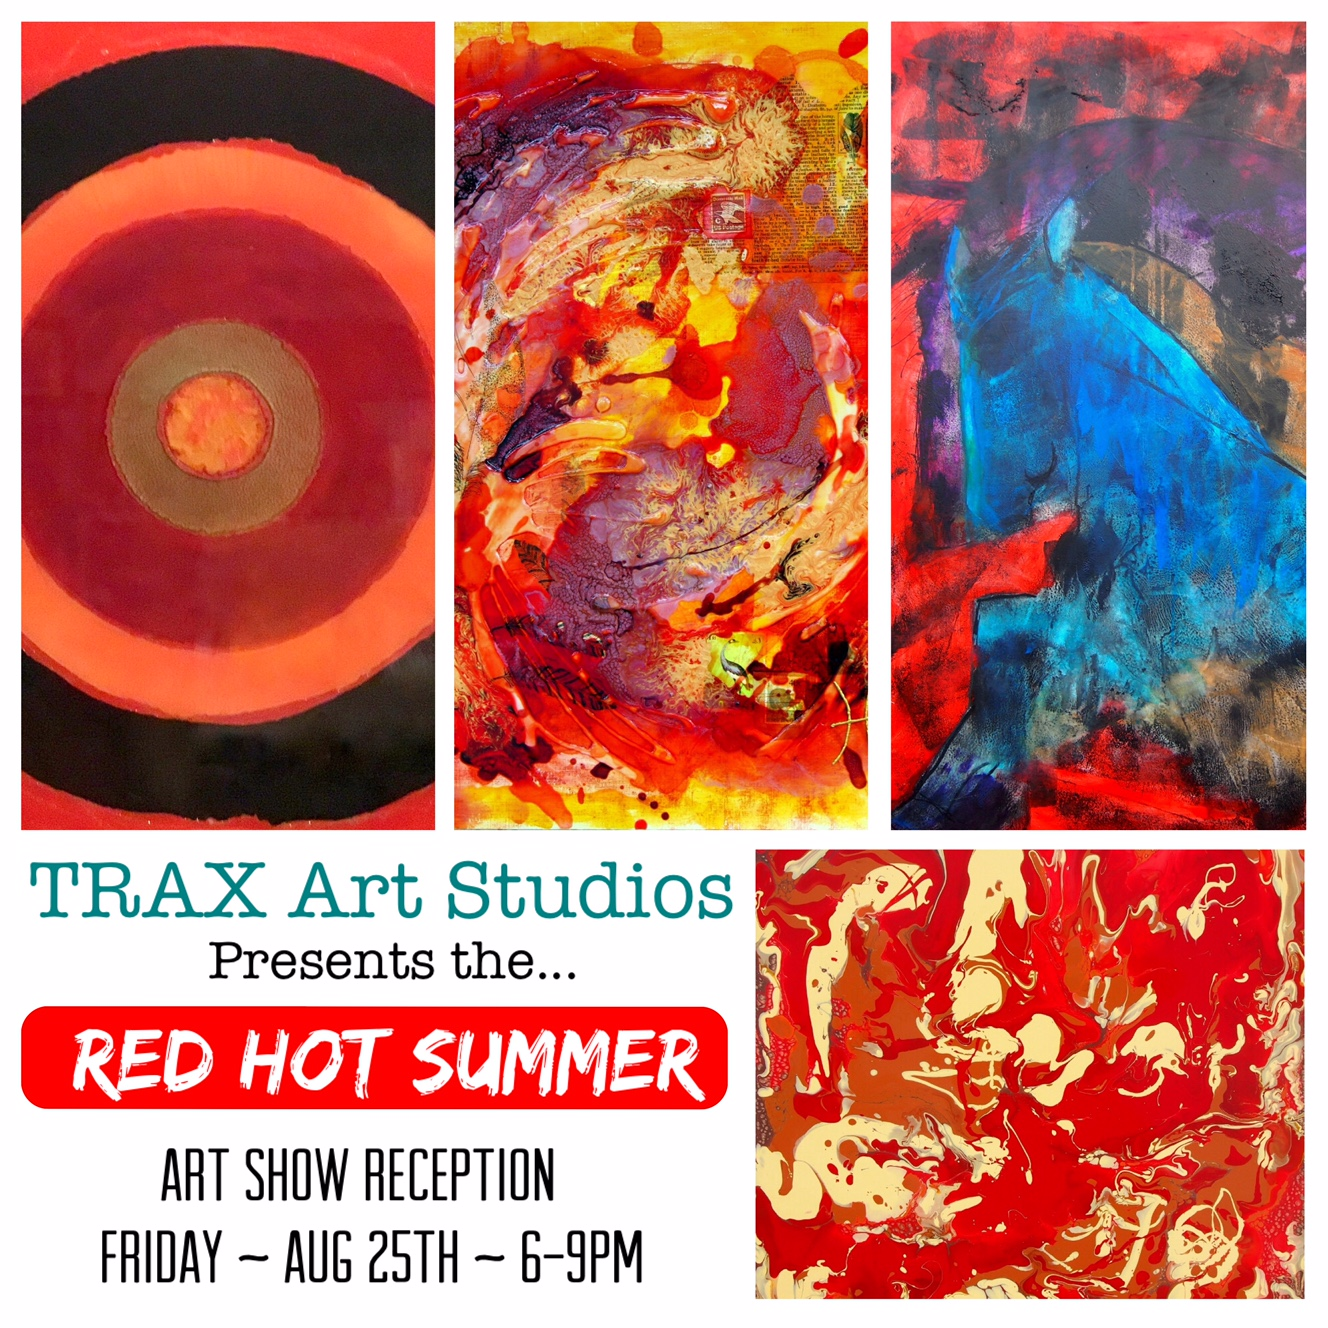 Red Hot Artwork from artists Tristina Dietz Elmes and Tatiana Cast.